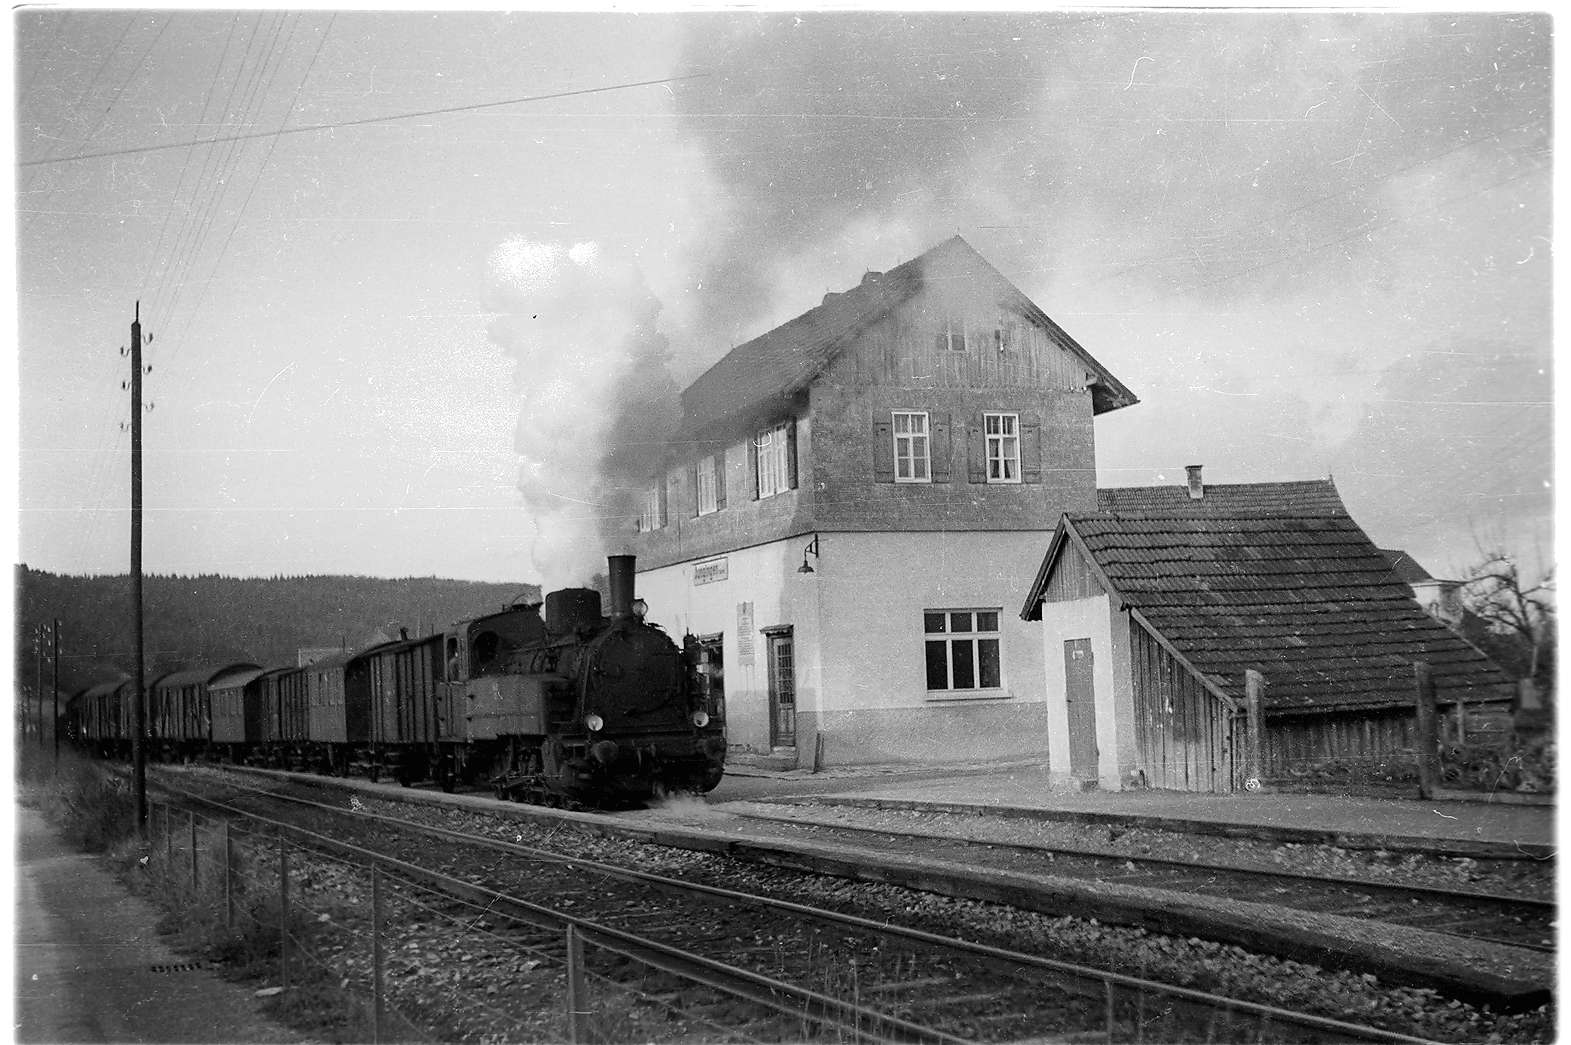 Bahnhof Jungingen, 1901 - 1985, Abbruch wegen Erdbebenschäden 1978, Lok 21, 2009 steht noch das Abortgebäude rechts, Lok 21 bläst ab, Bild 1